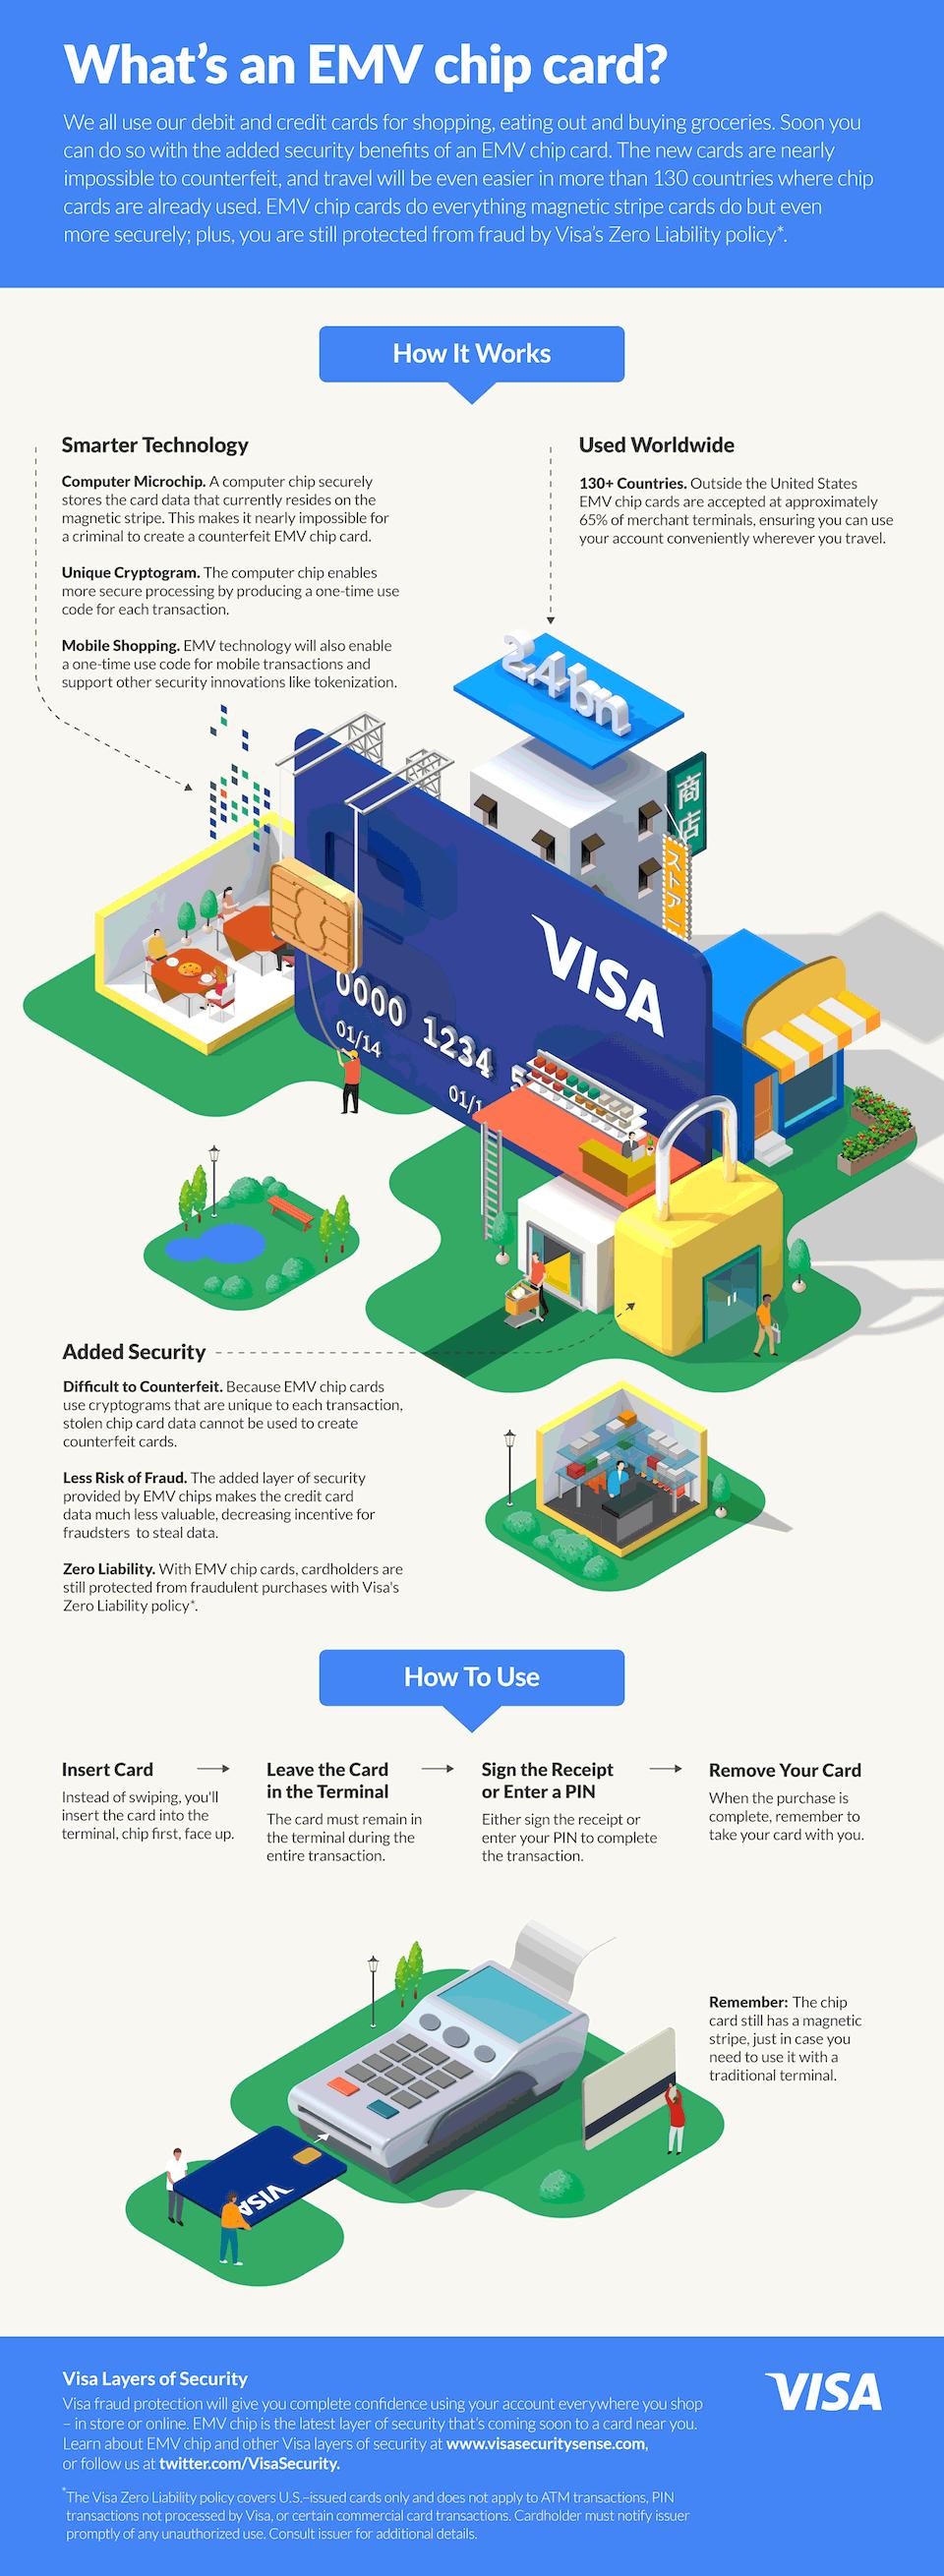 Infographic Hoe de EMV chipcard werkt